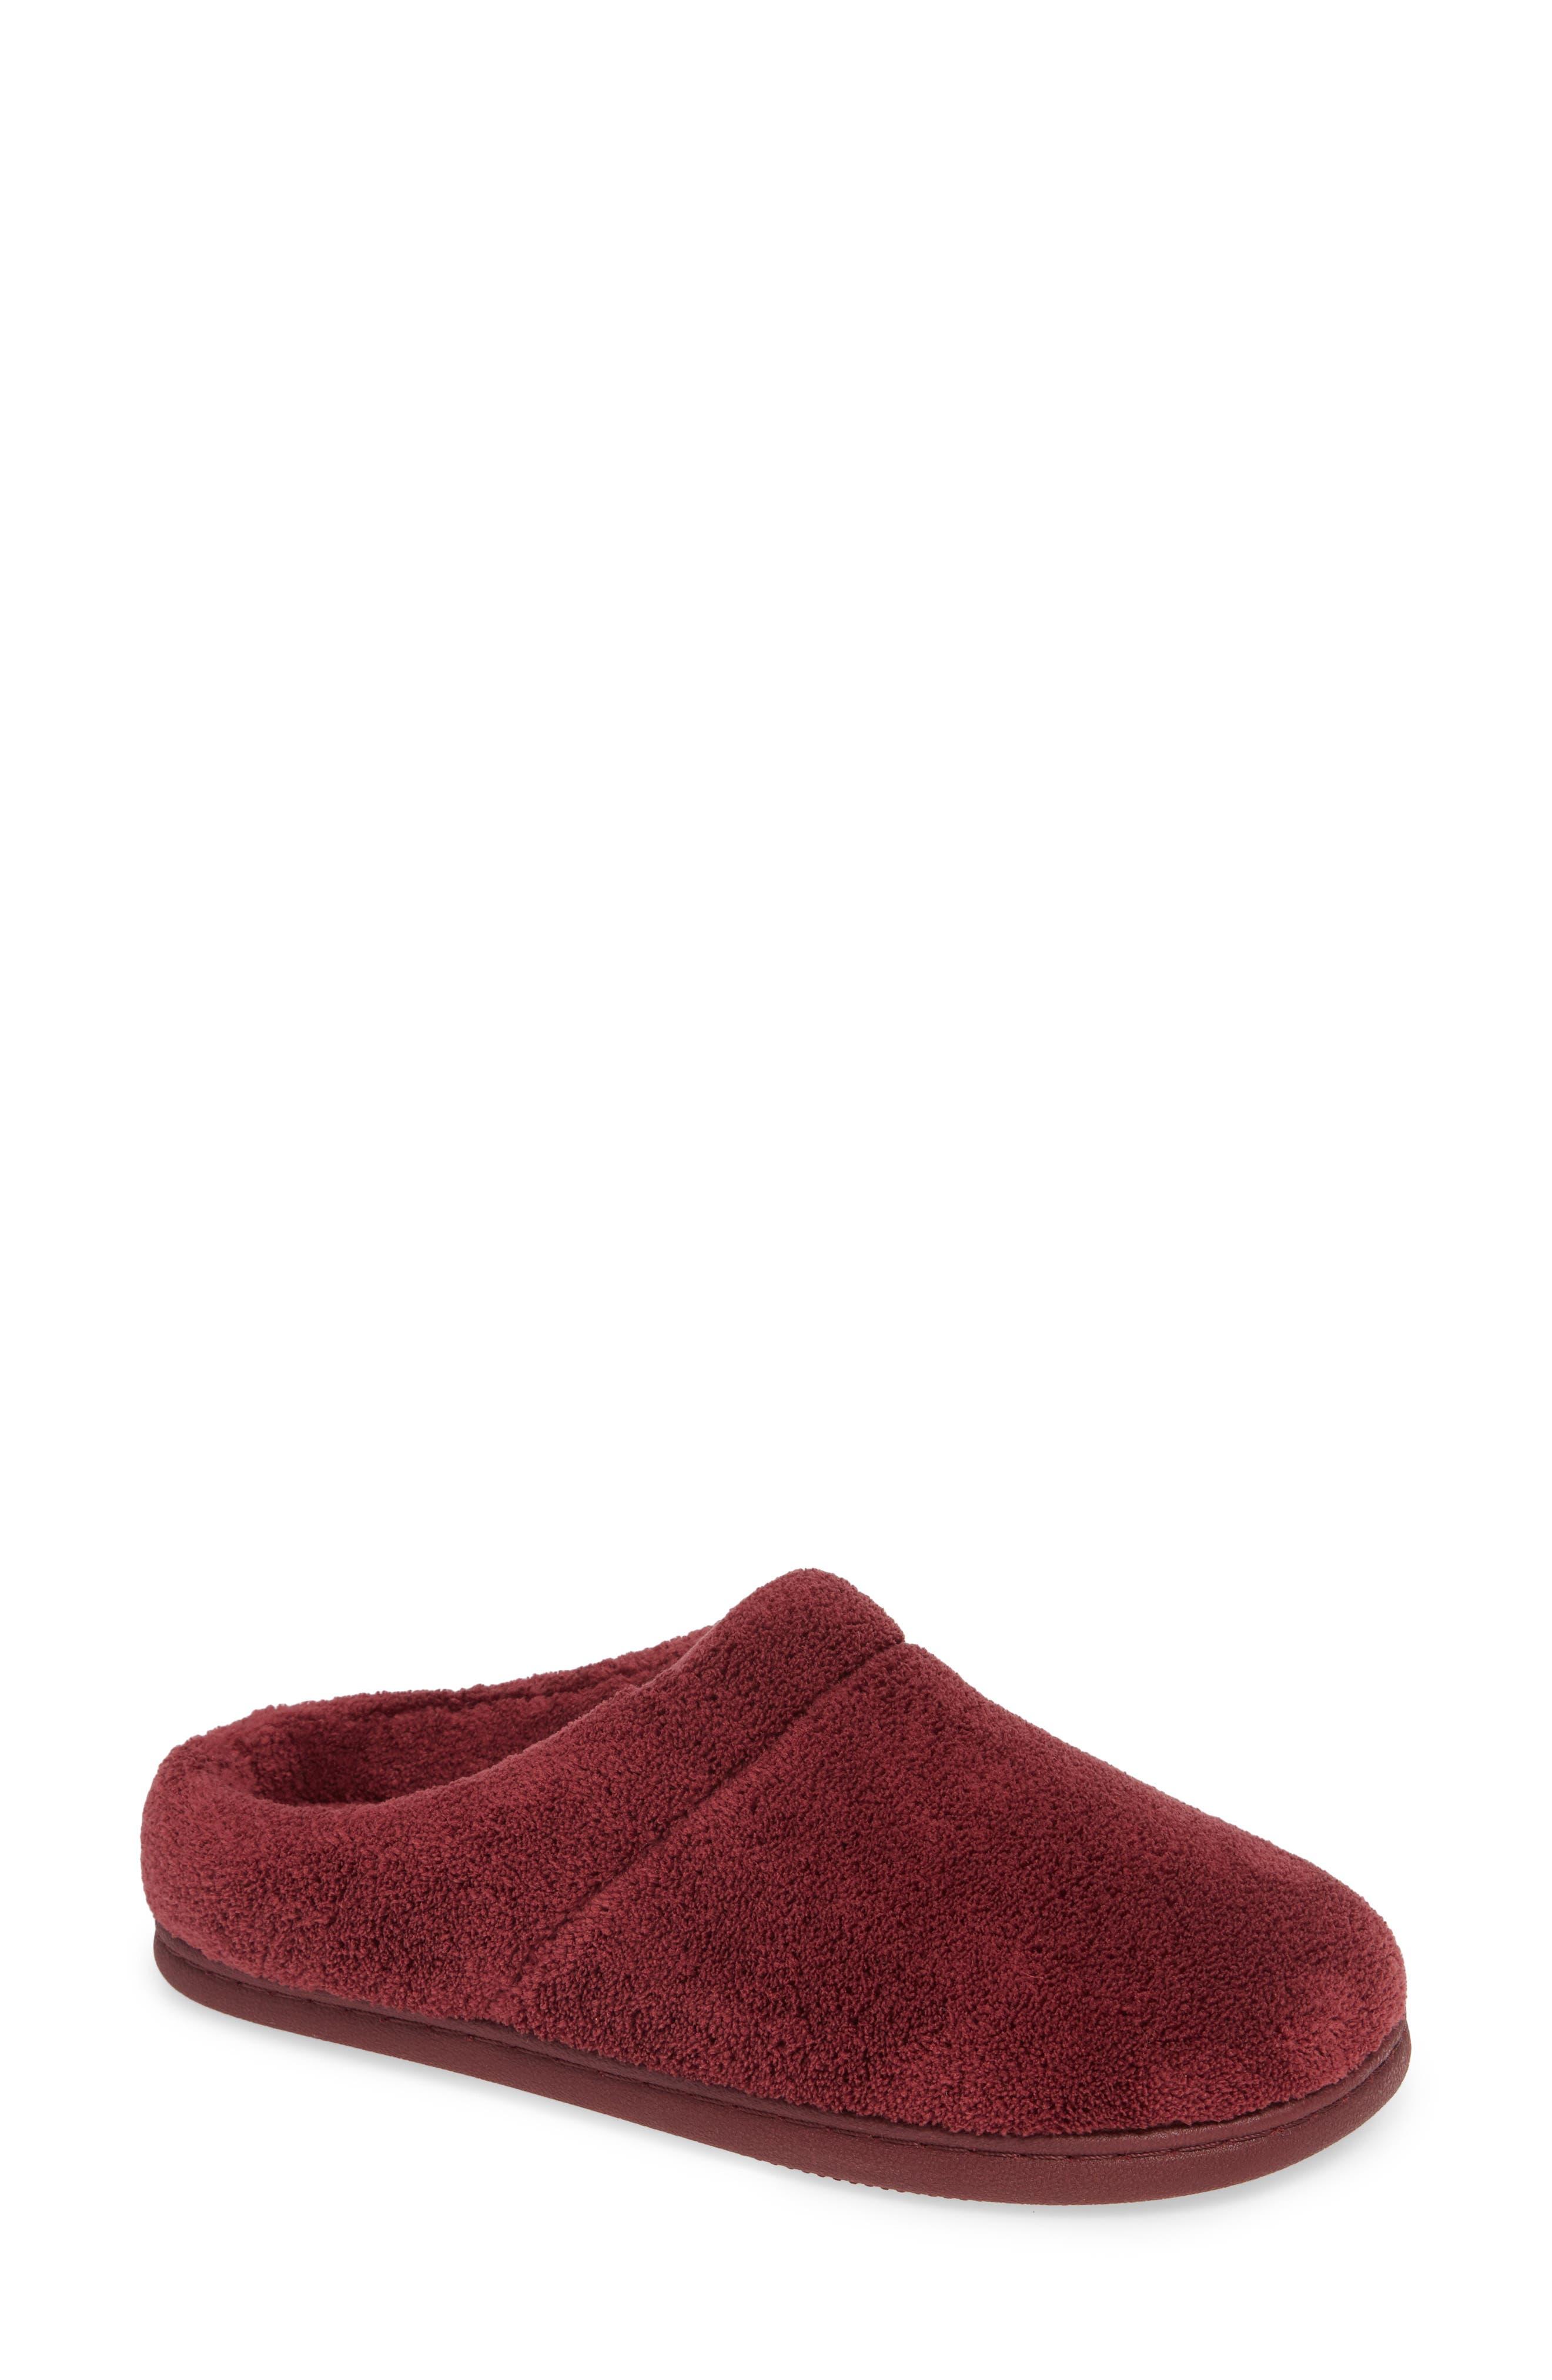 'Windsock' Slipper,                         Main,                         color, BURGUNDY